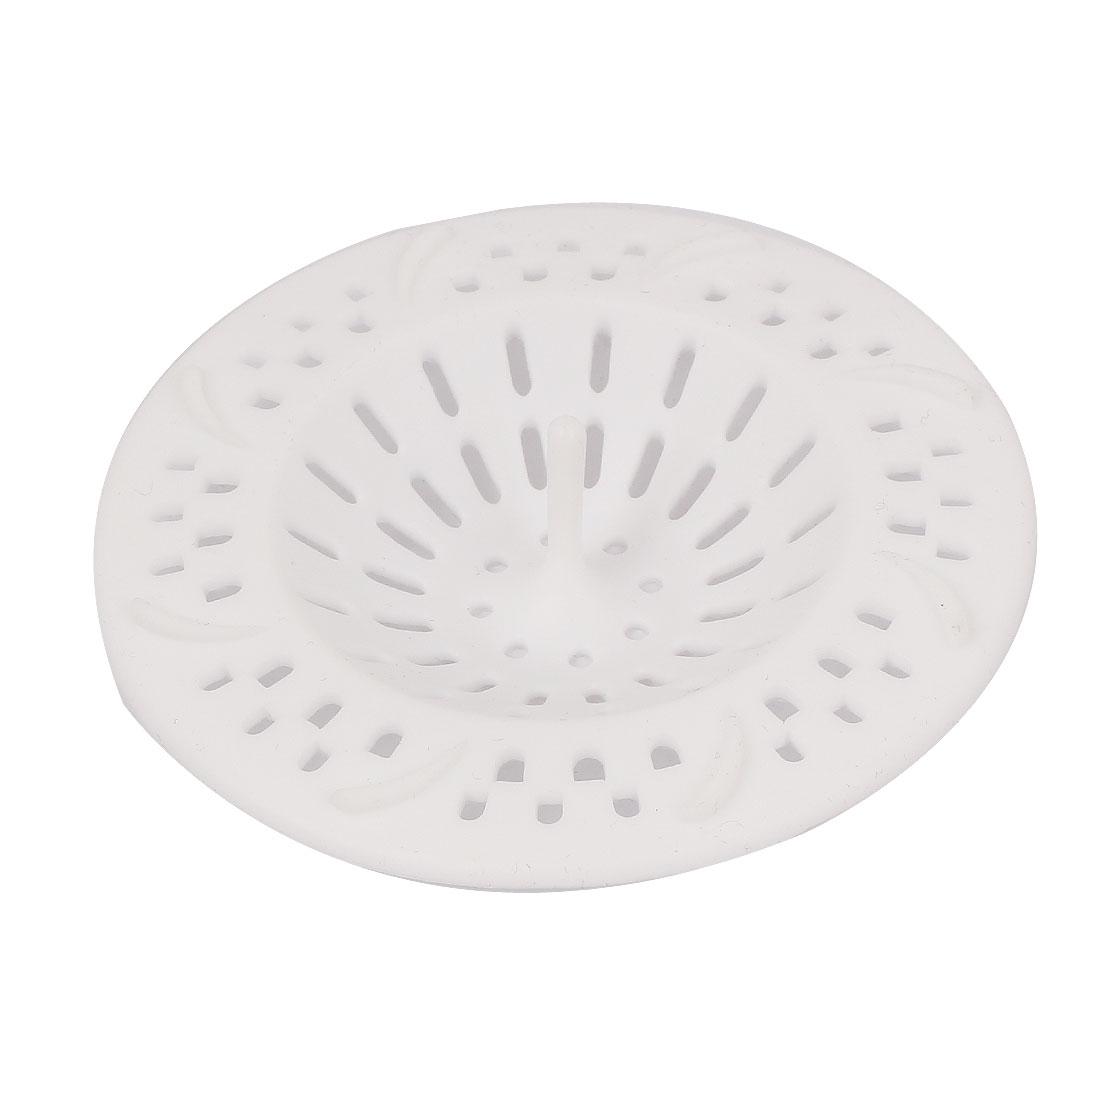 95mm Dia Kitchen Bathtub Waste Drain Strainer Filter Hair Catcher Stopper White